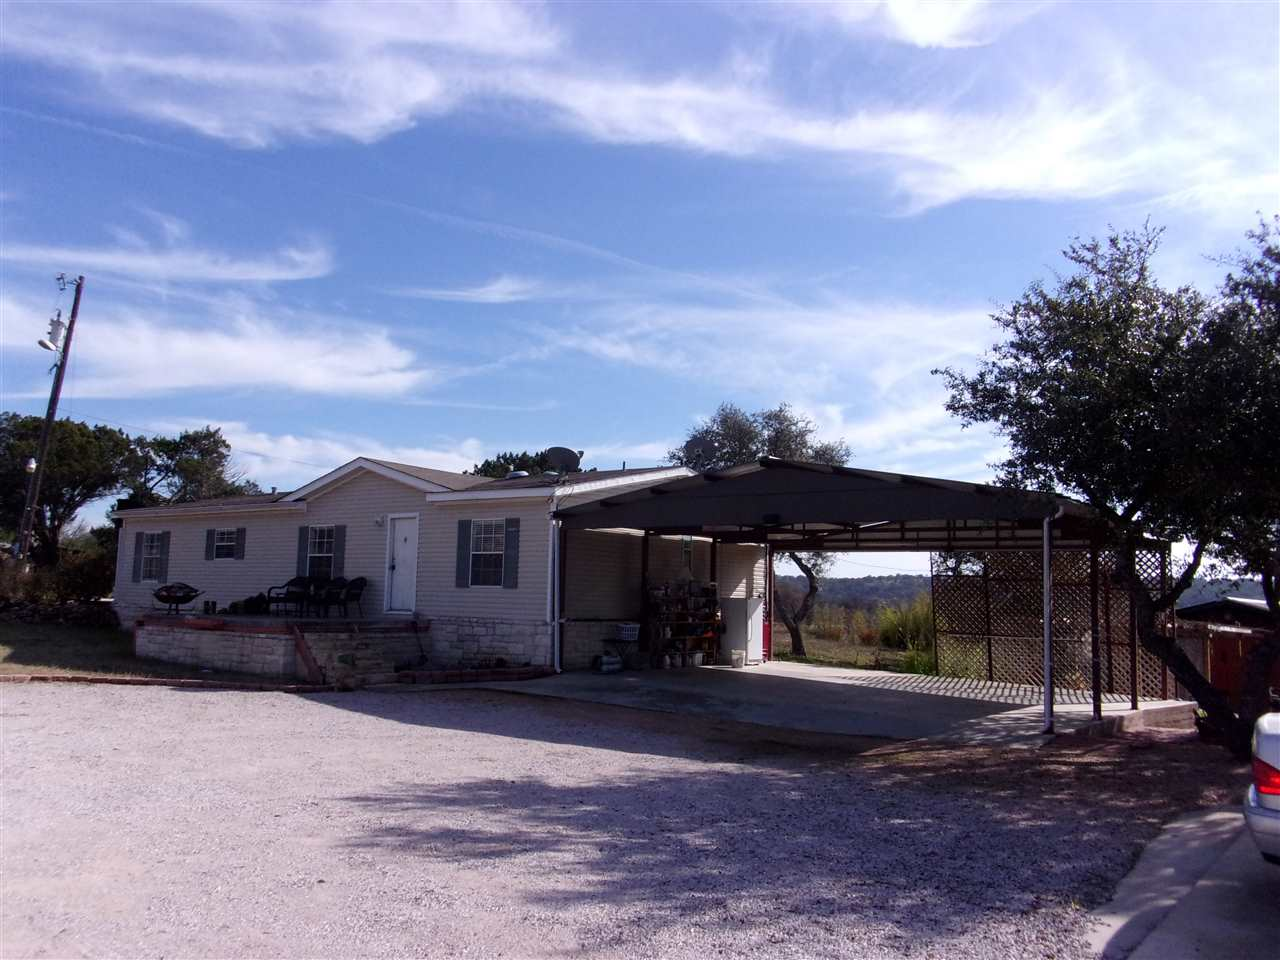 307 Yucca Dr., Burnet, TX 78611 - MLS #142483